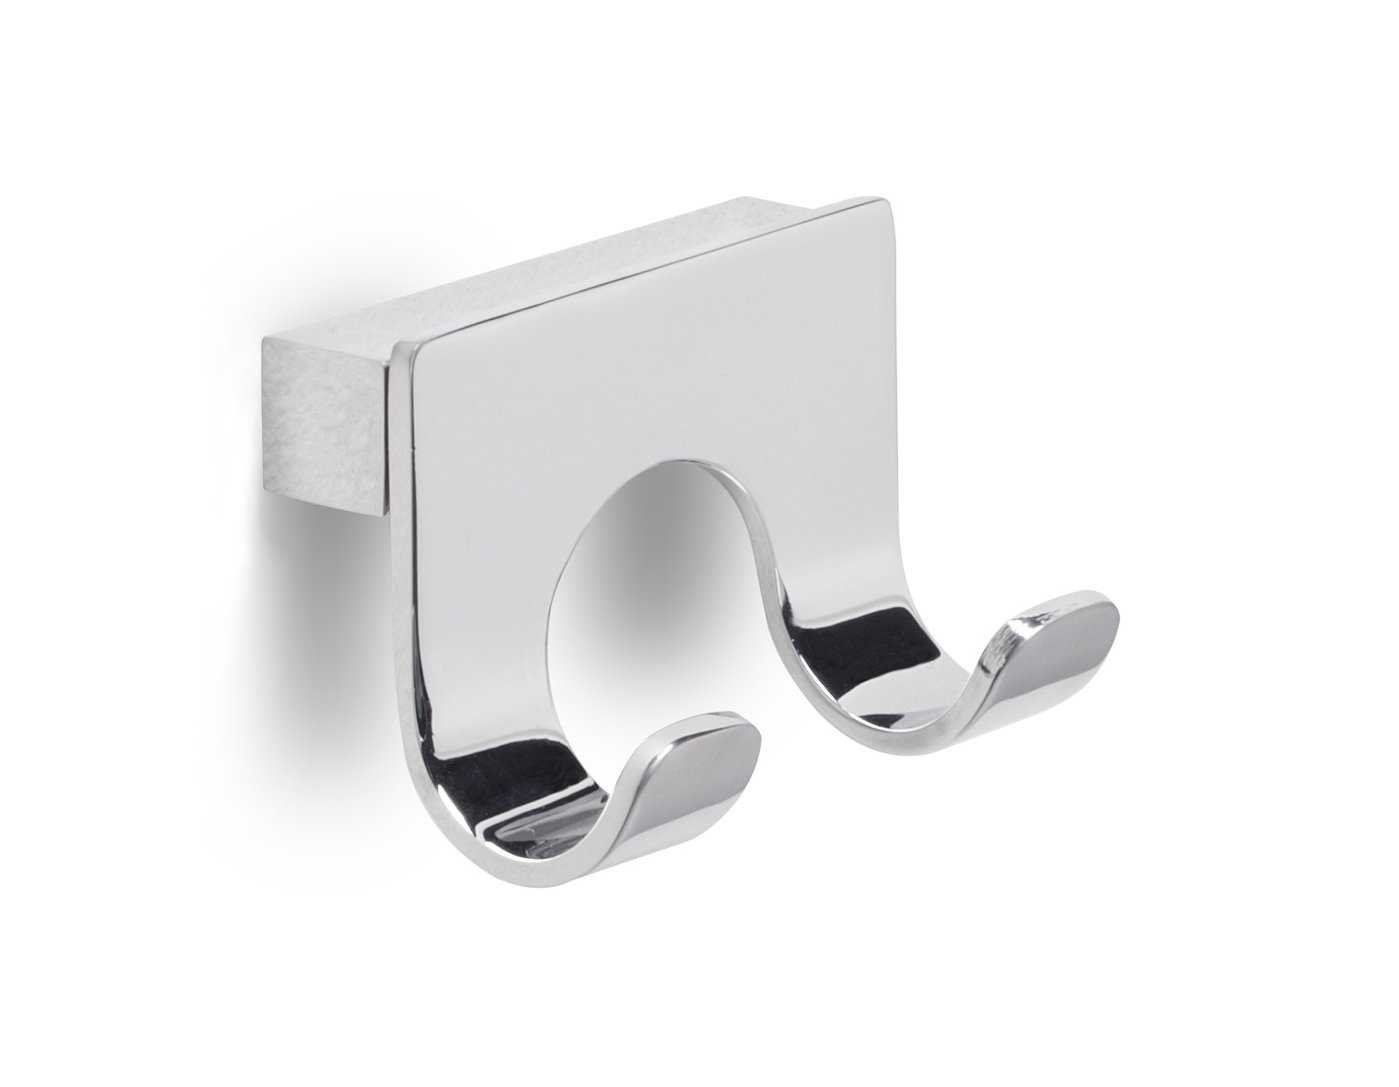 Roper Rhodes - Halo Bathroom Accessories by Nick Hunter at Coroflot.com